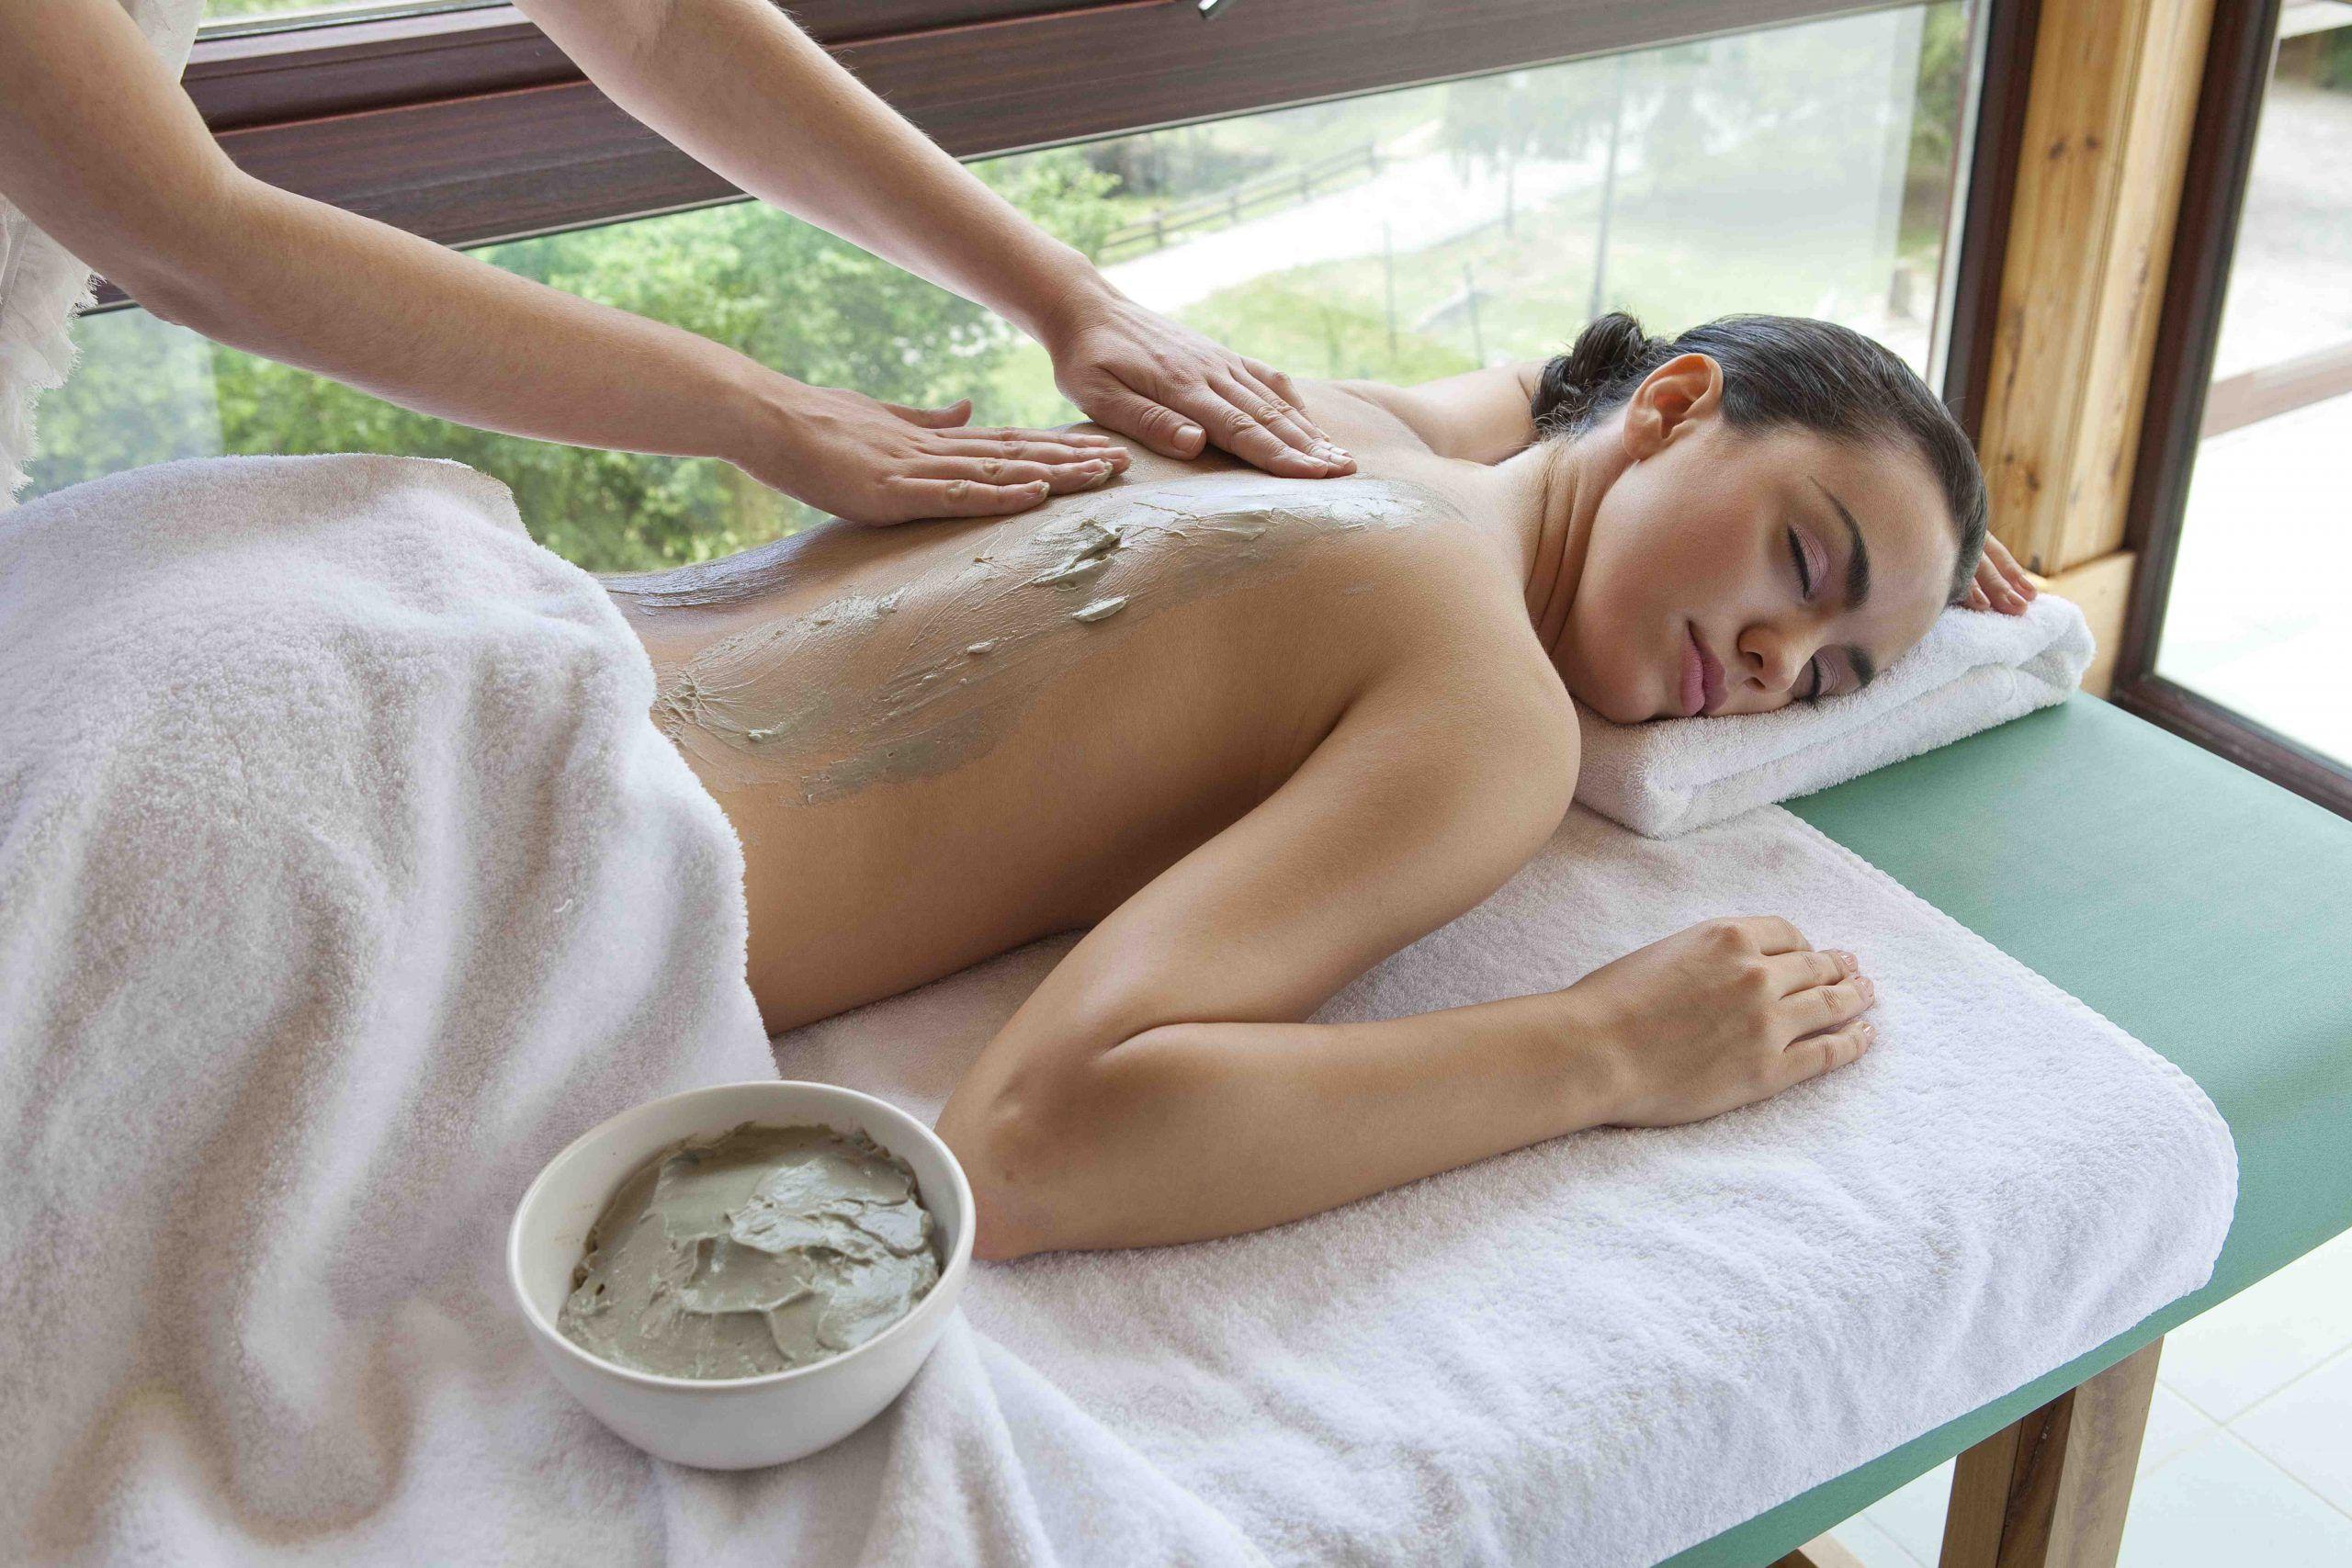 mejores planes beauty circuito clades de boí masaje